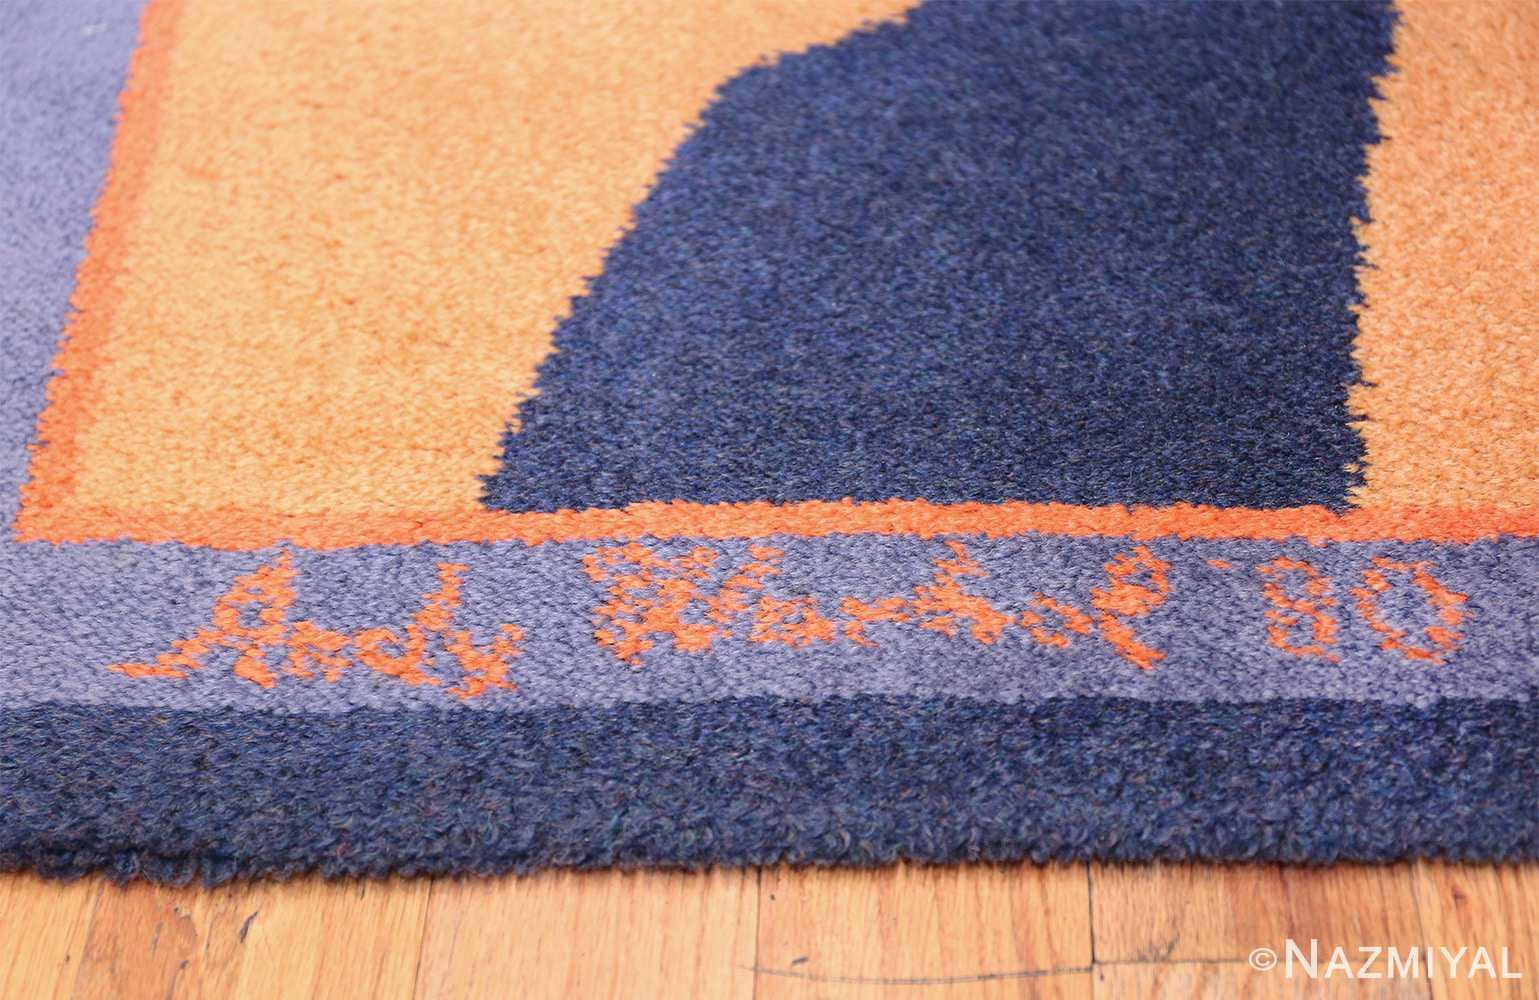 Vintage Andy Warhol Ege Art Line Diamond Dust Shoes Scandinavian rug 49784 signature Nazmiyal